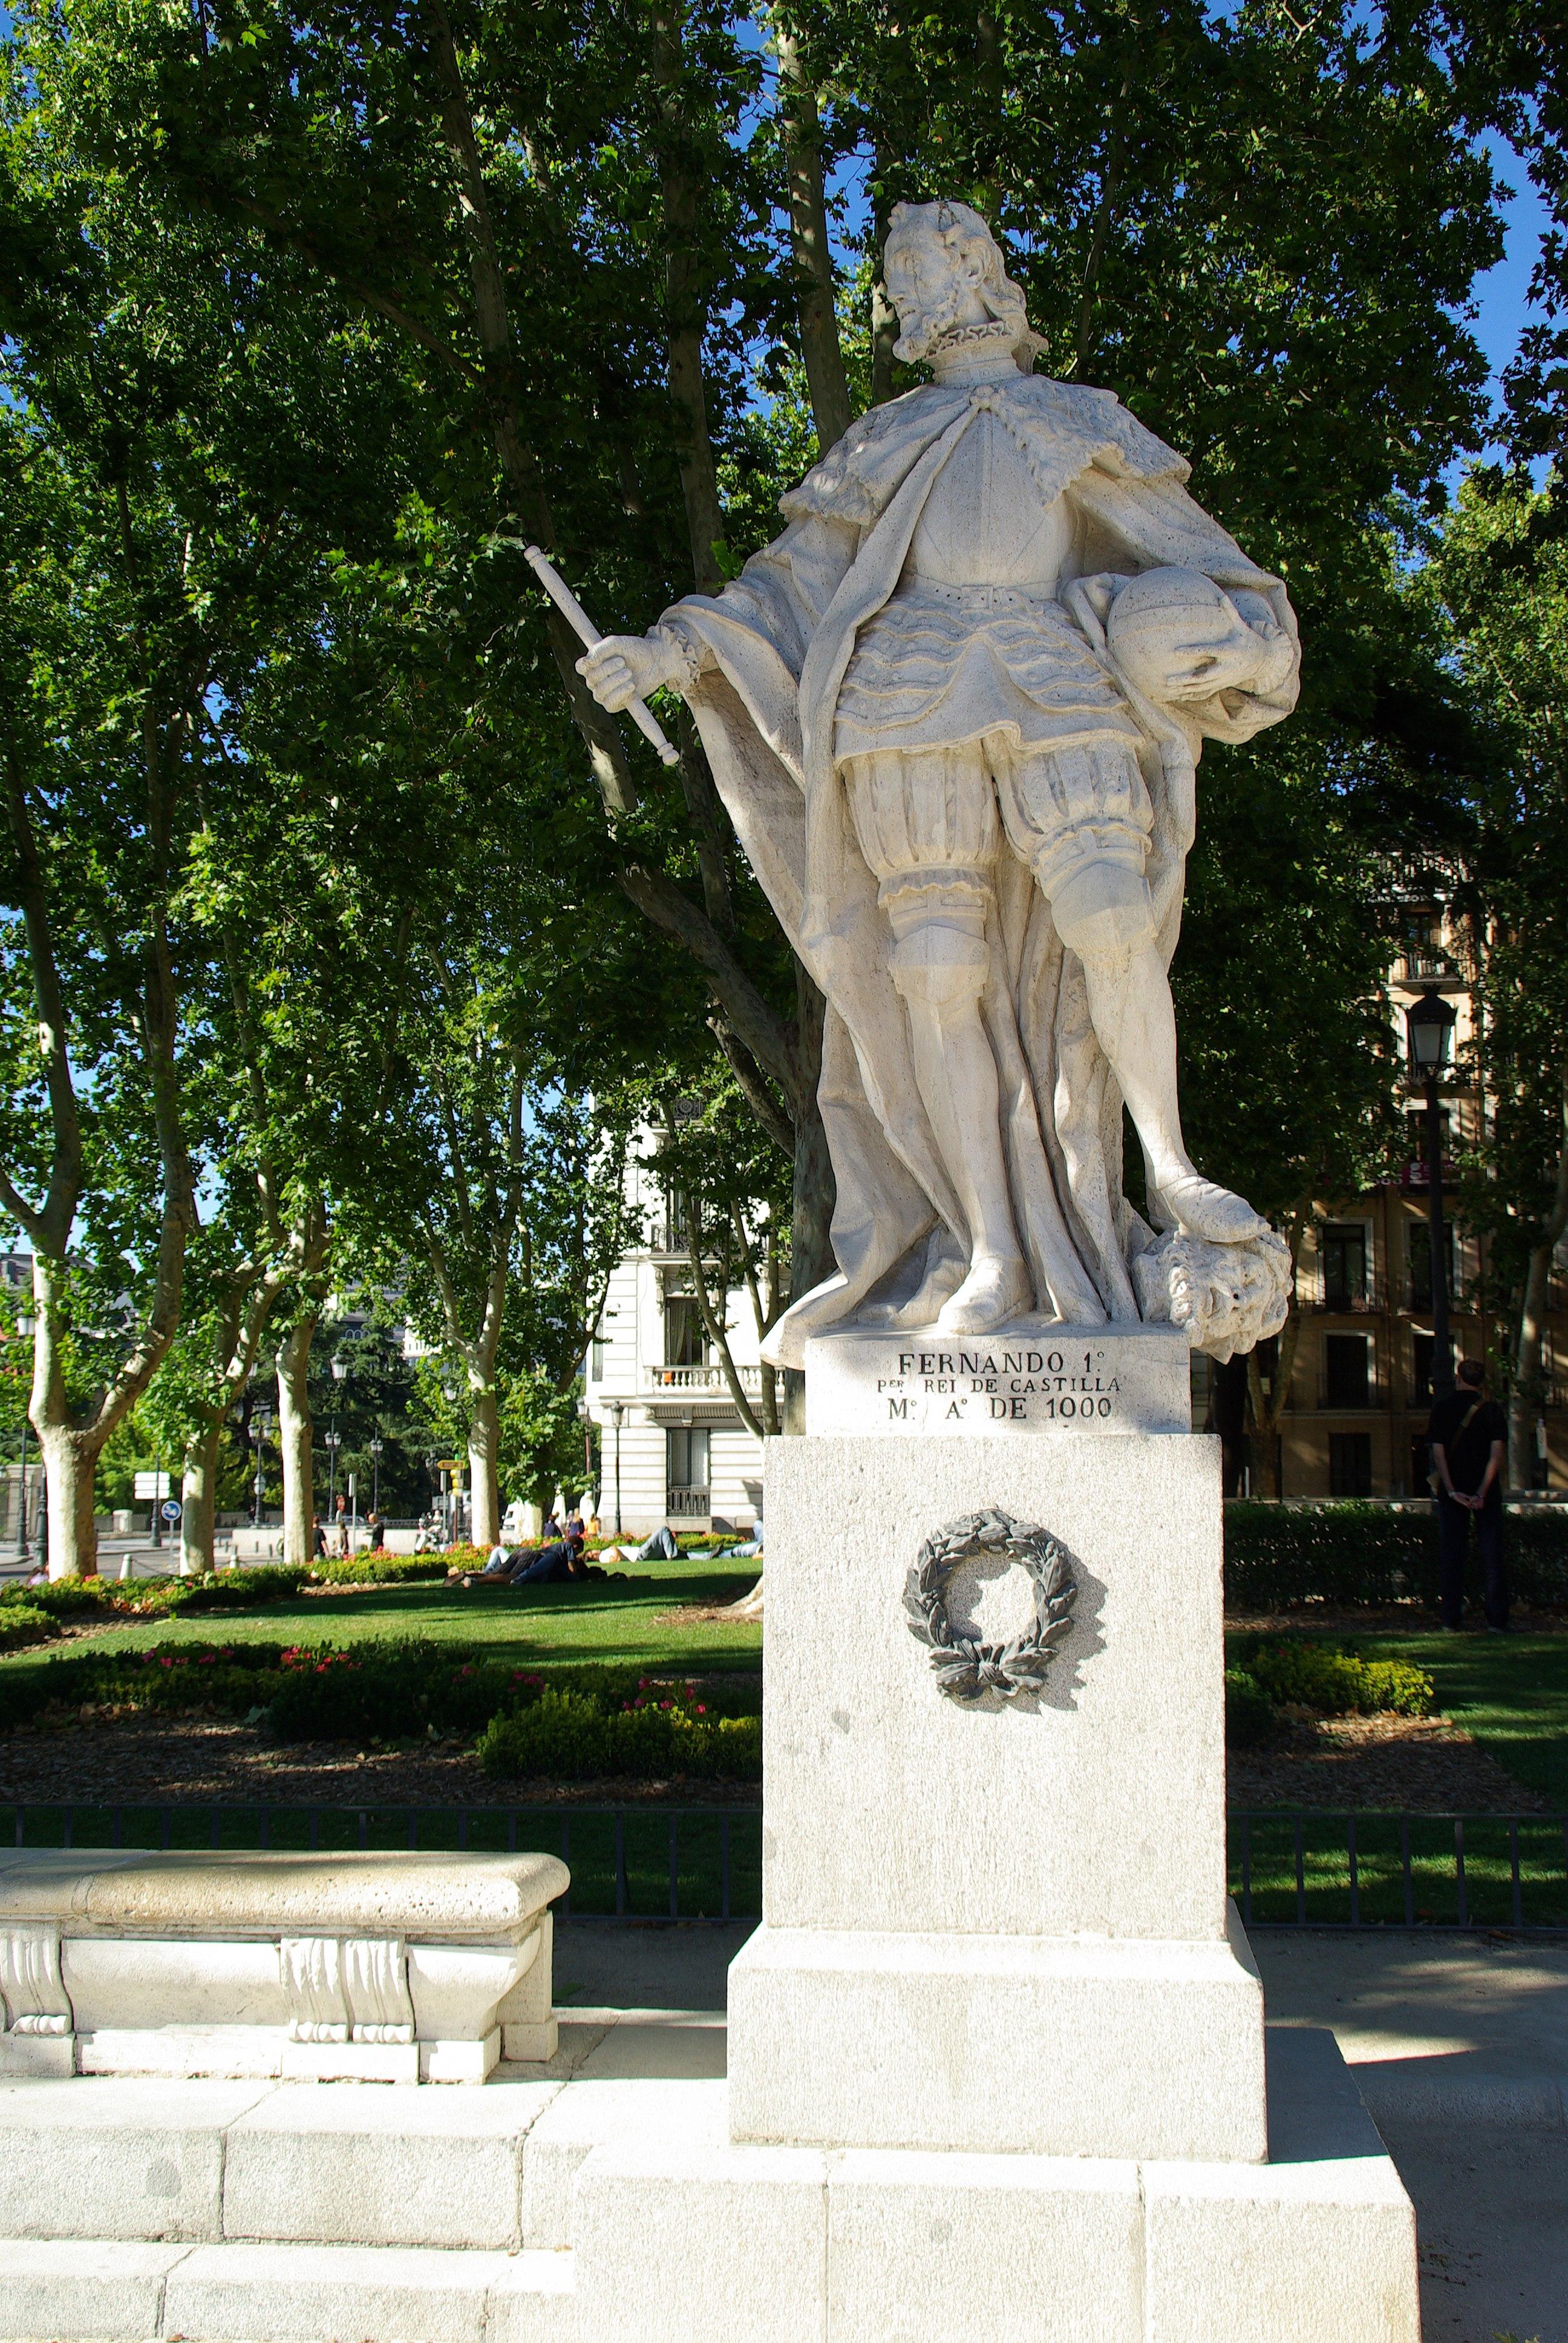 Estatuas de jardin great foto con mi mochila a cuestas for Estatuas jardin